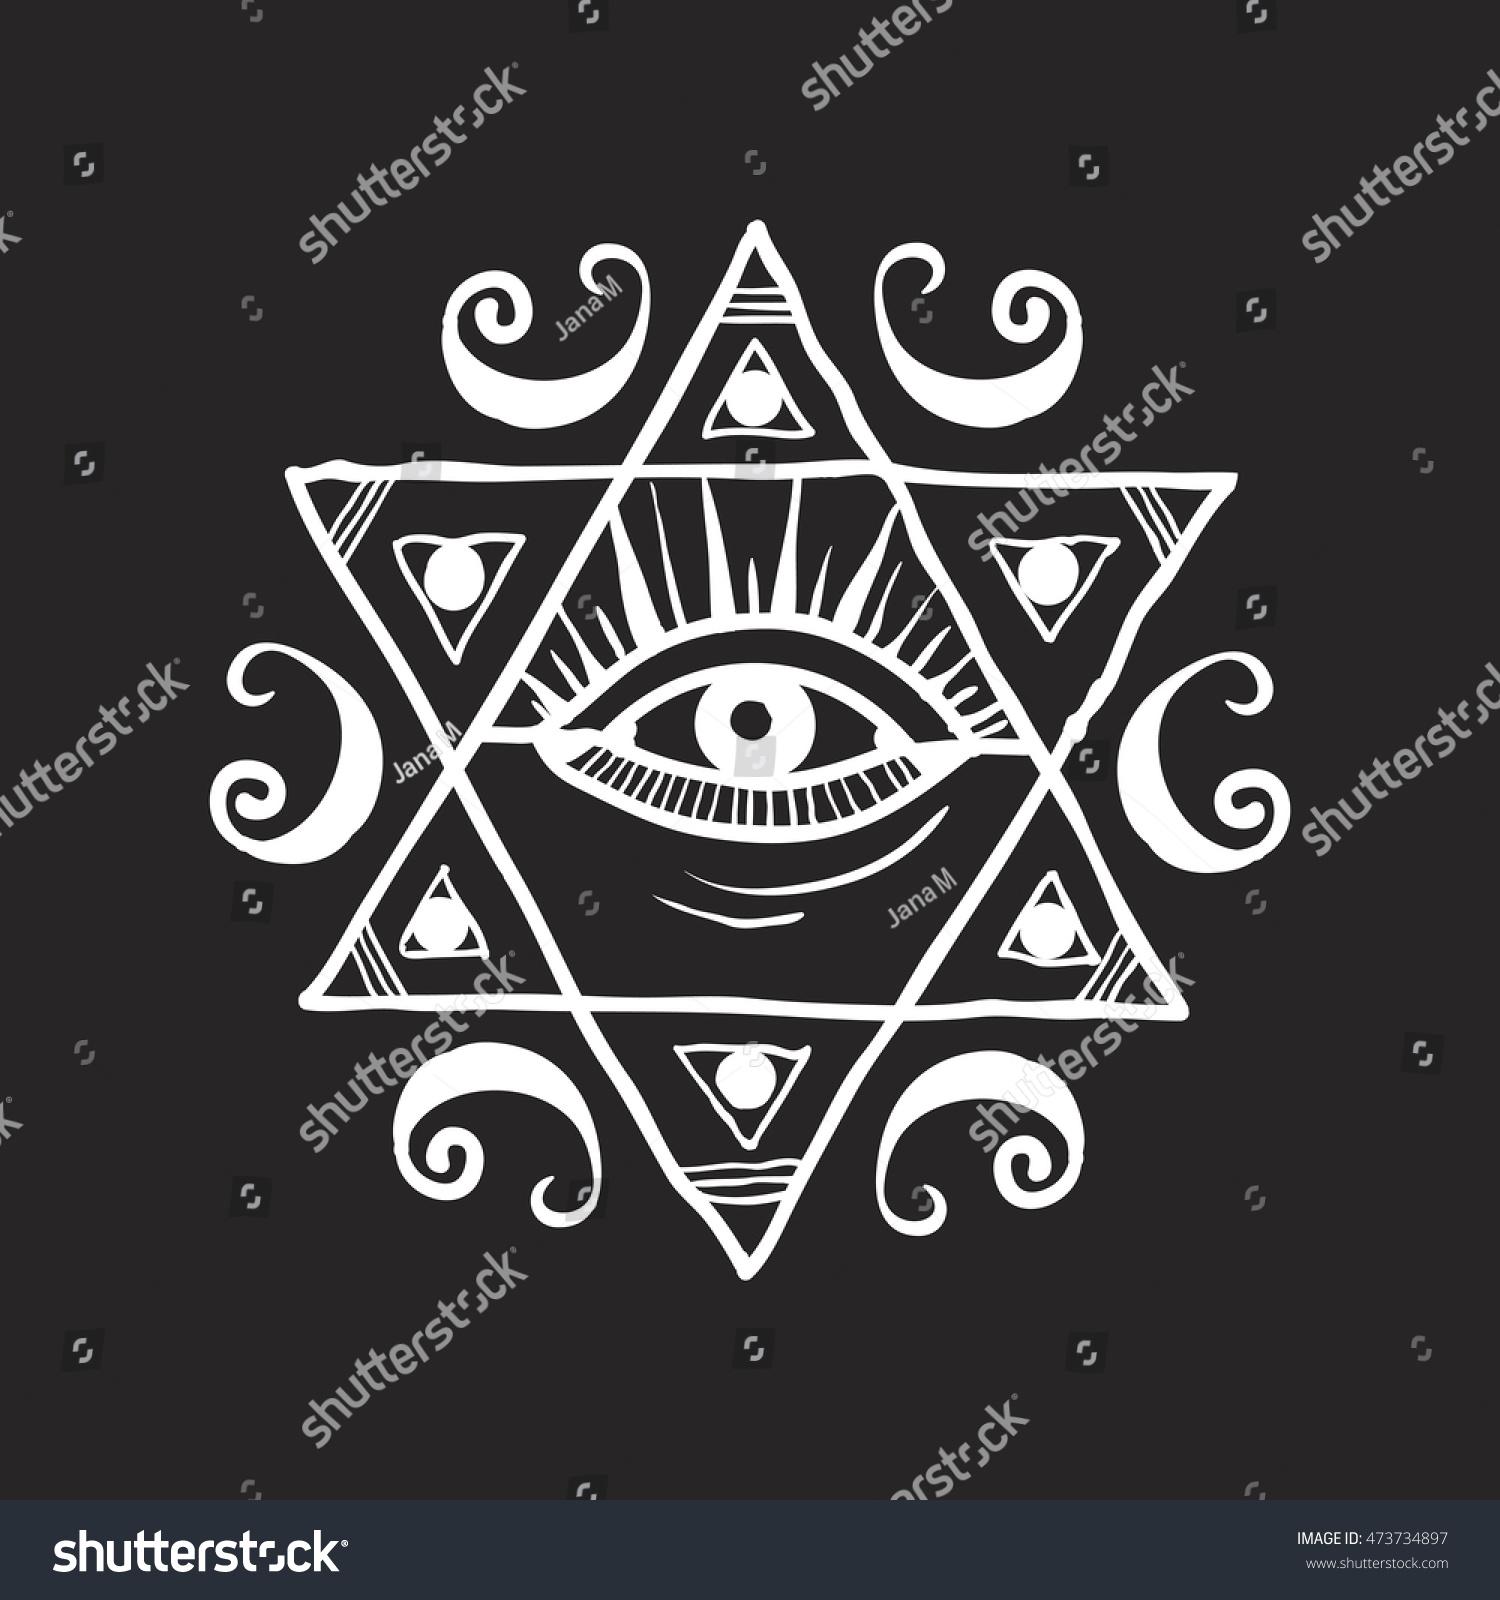 Hand drawn ancient mystical symbol eye stock vector 473734897 hand drawn ancient mystical symbol an eye in the hexagon on a black background biocorpaavc Choice Image